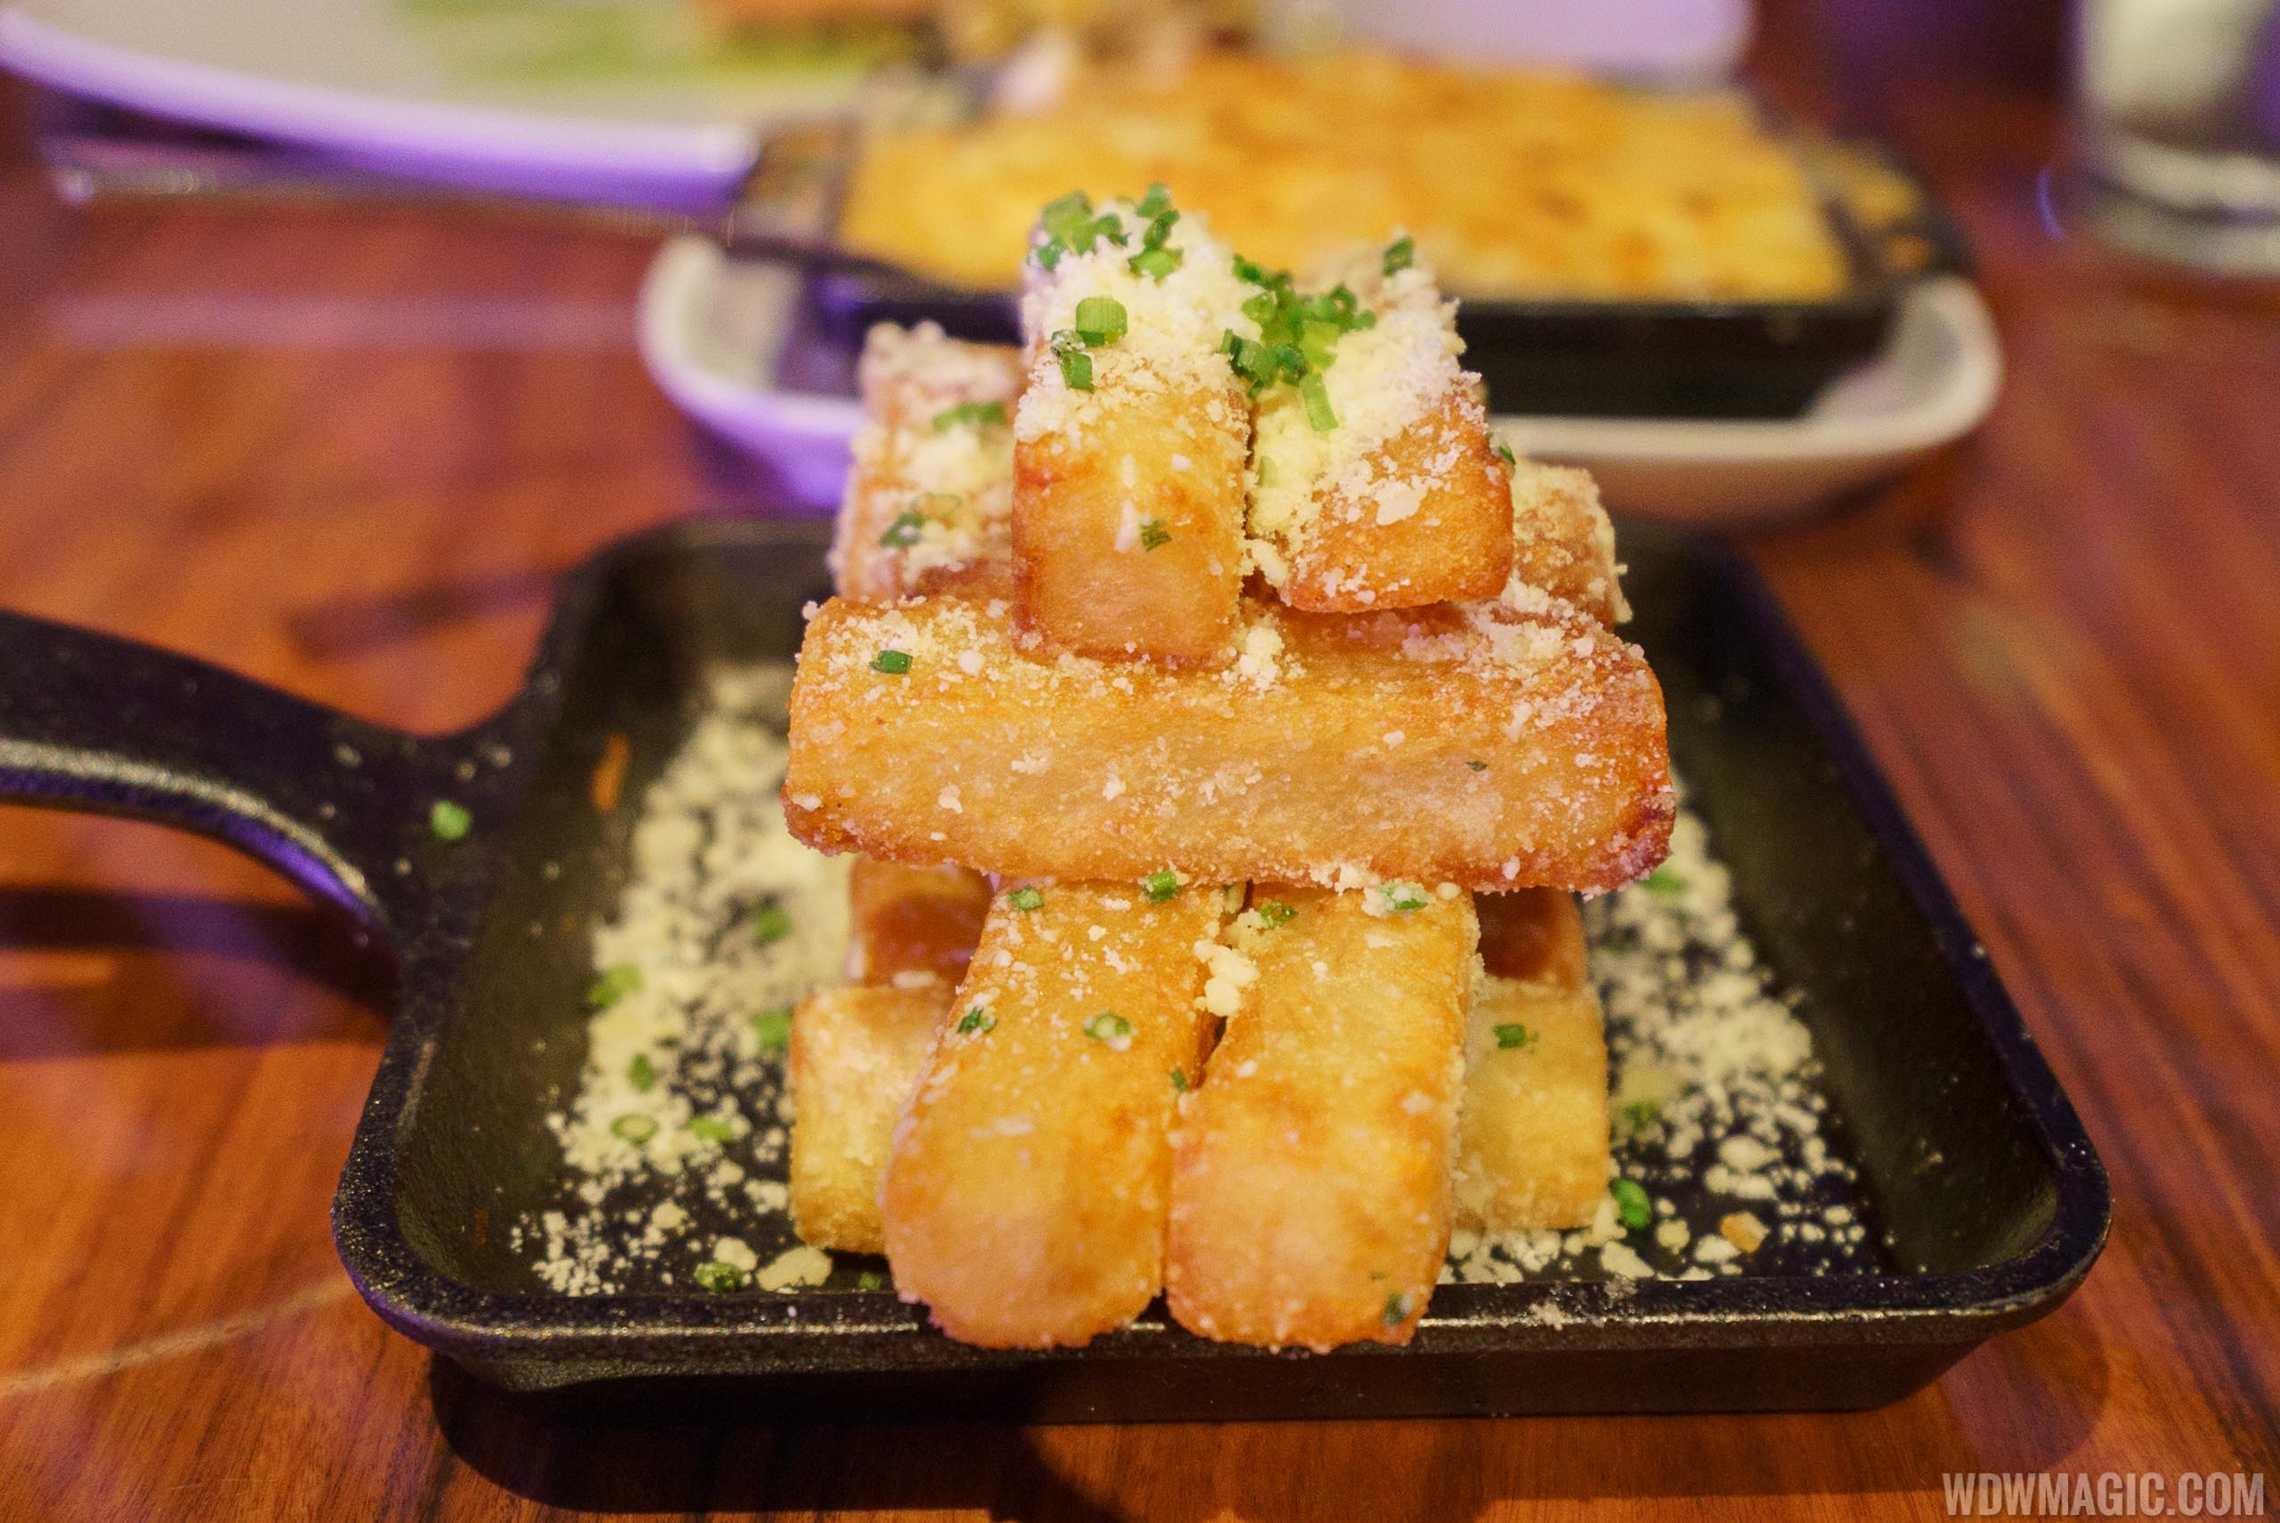 STK Orlando - Parmesan Truffle Fries